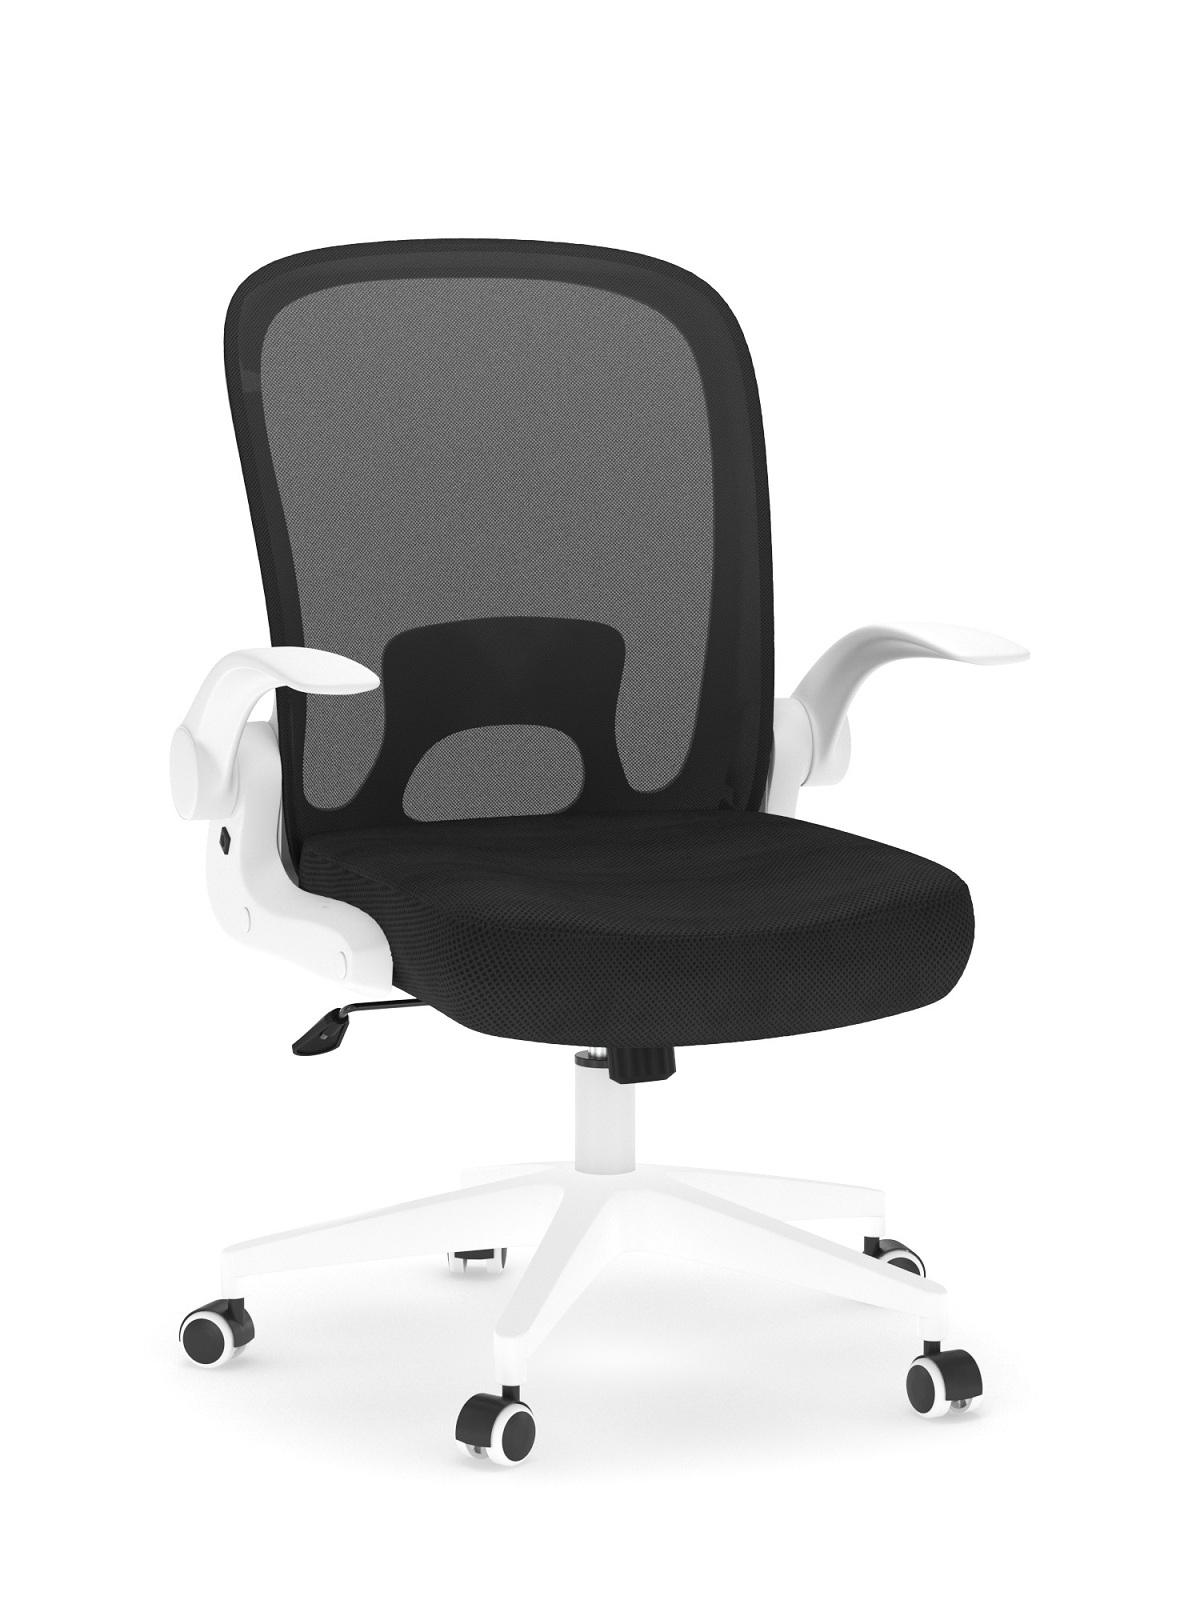 Офисное кресло Loftyhome Template black/white VC6007 BW